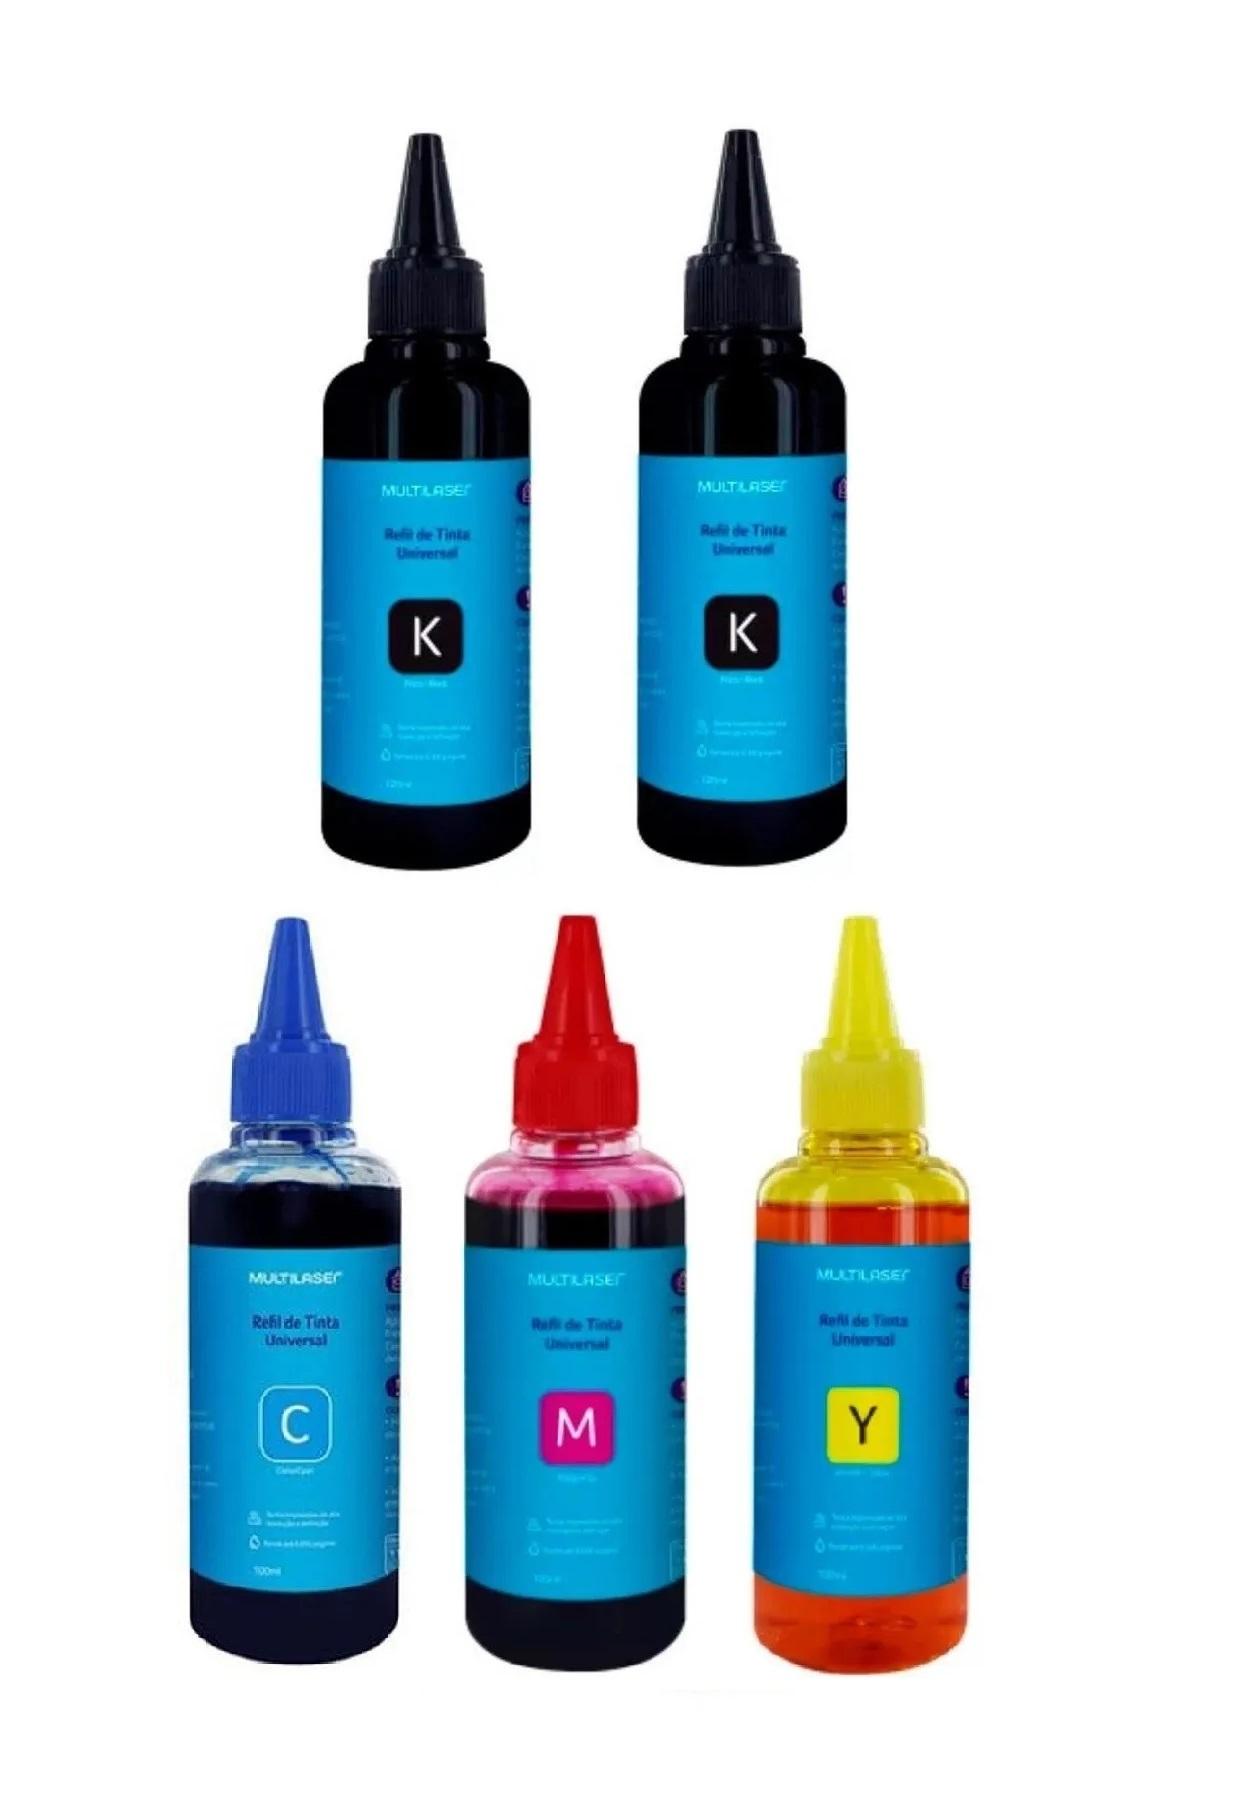 Kit Refil De Tinta Multilaser Preto amarelo ciano e magenta para impressora Epson 5 unid  - Mix Eletro